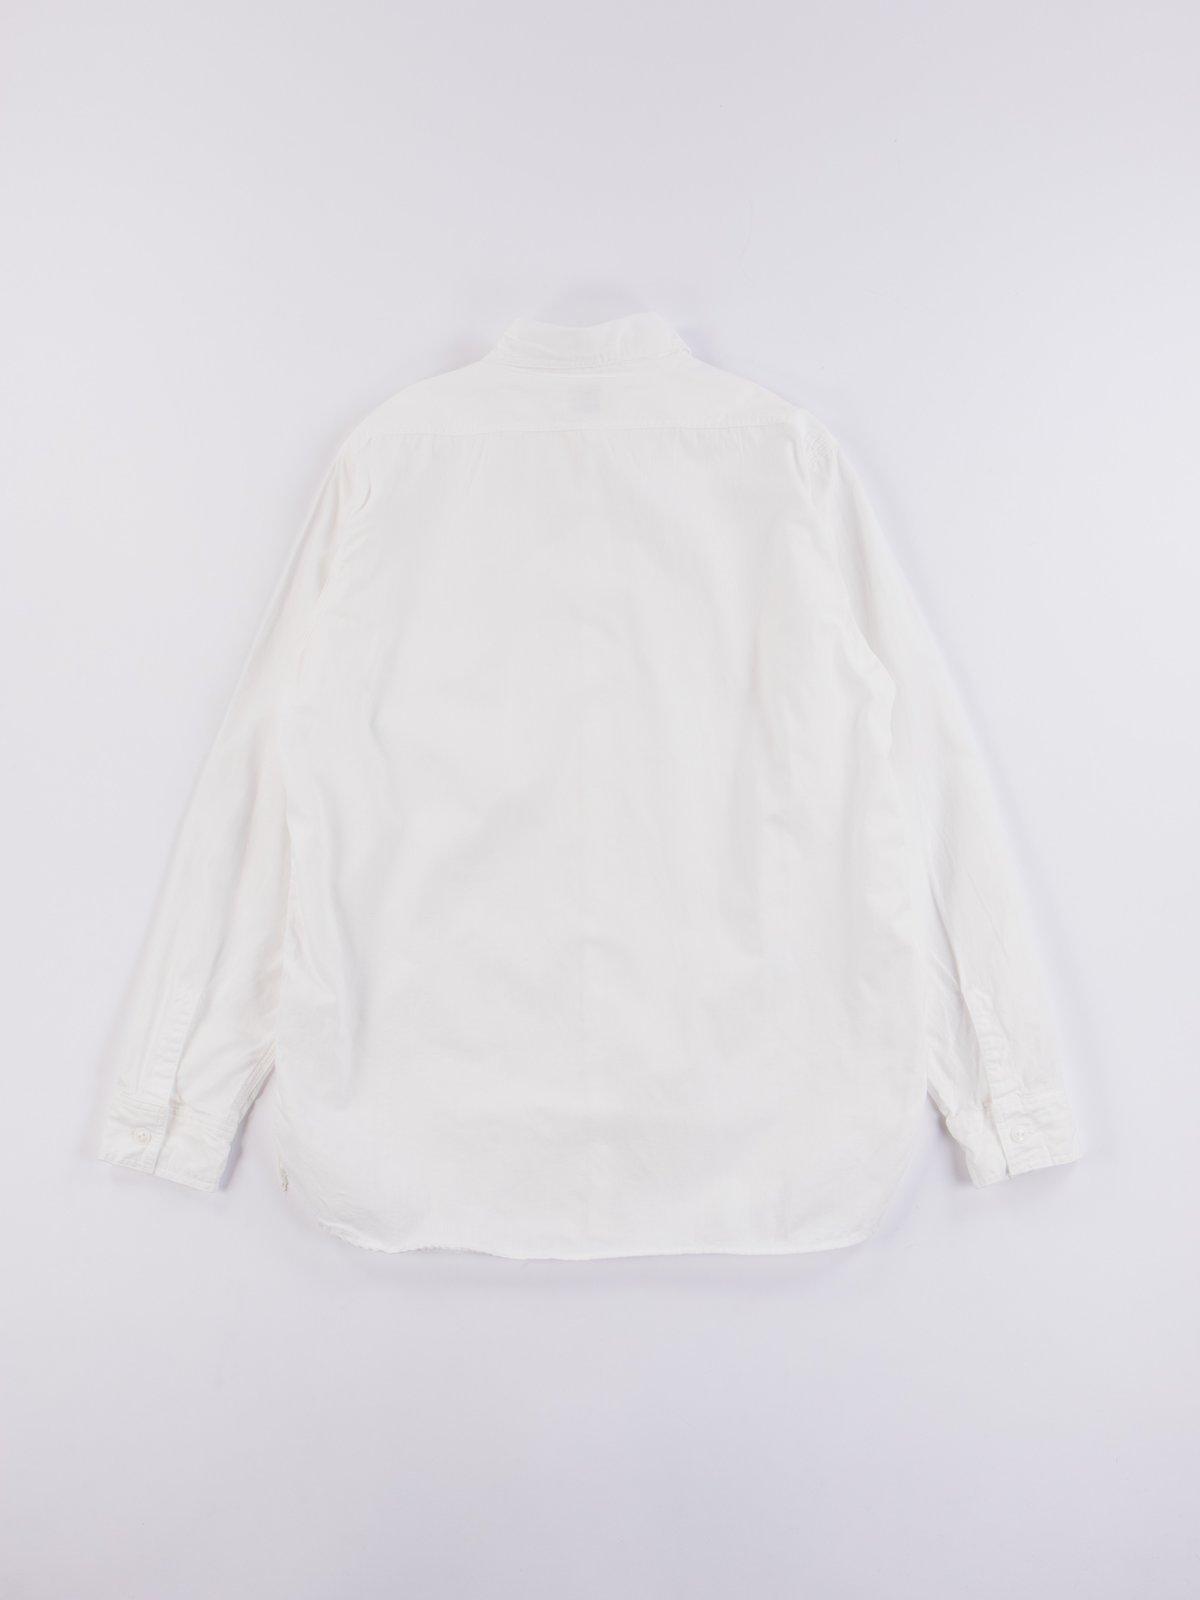 White Chambray Work Shirt - Image 5